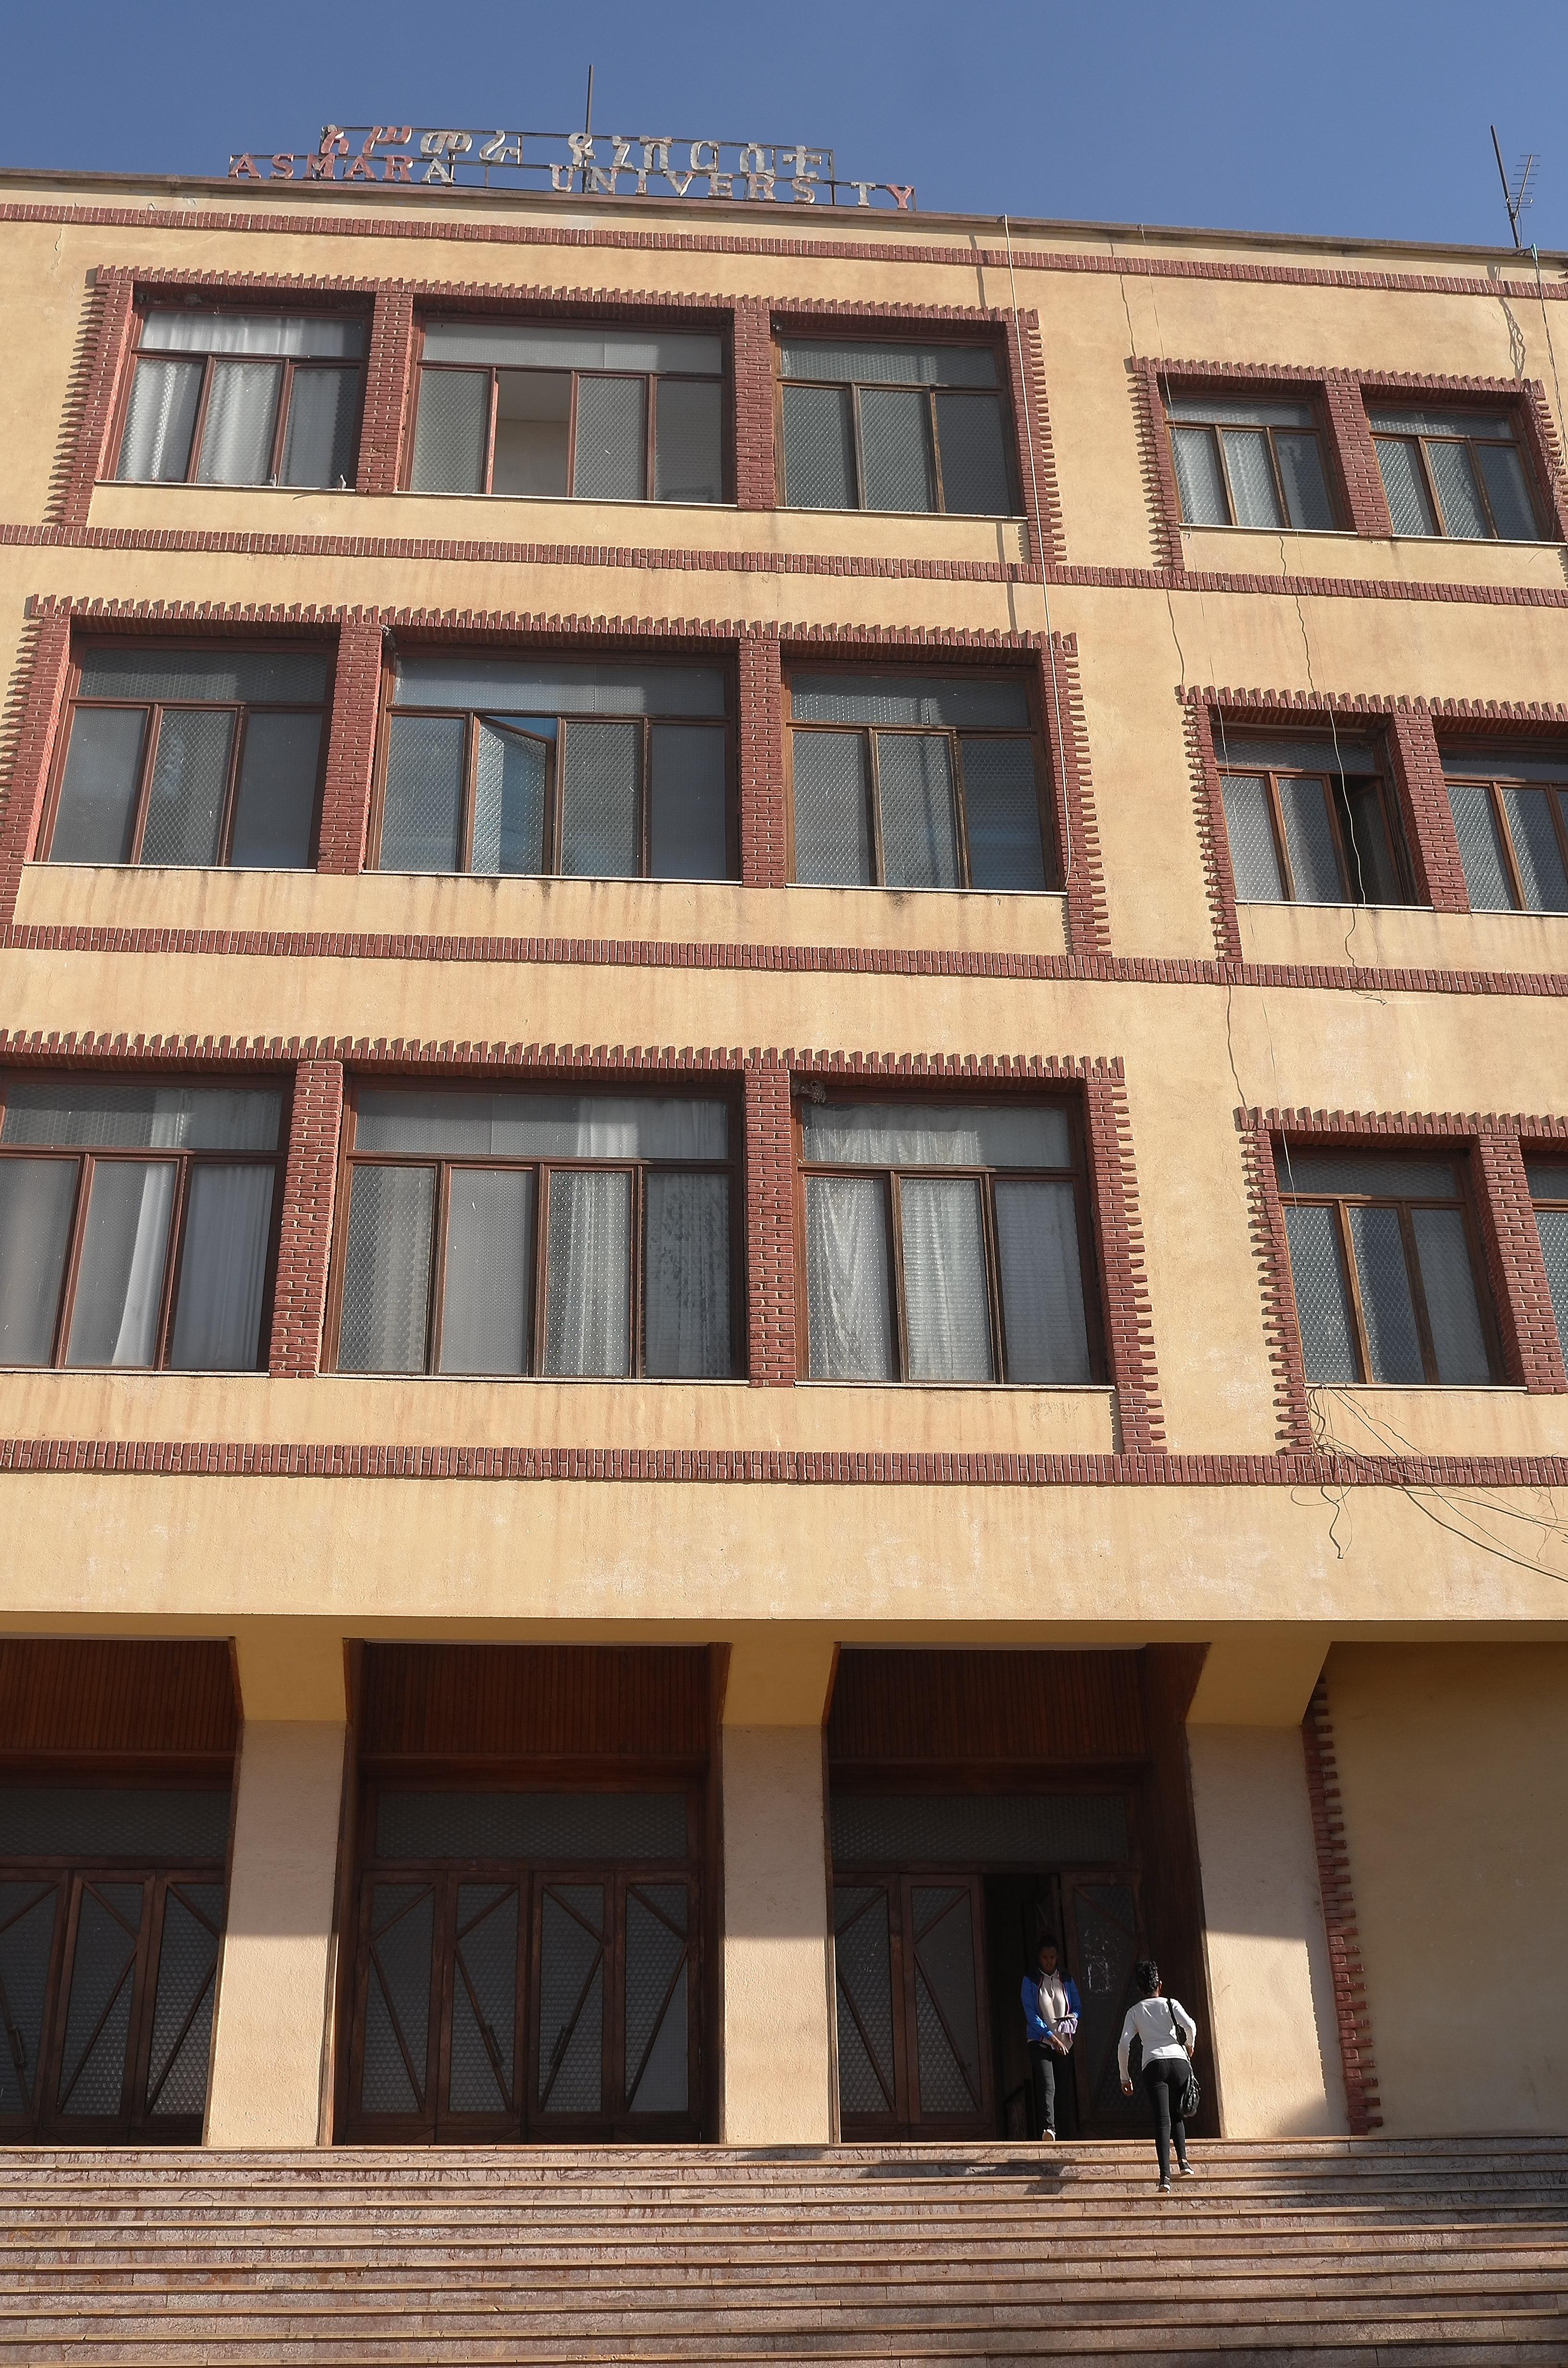 File:University of Asmara jpg - Wikimedia Commons